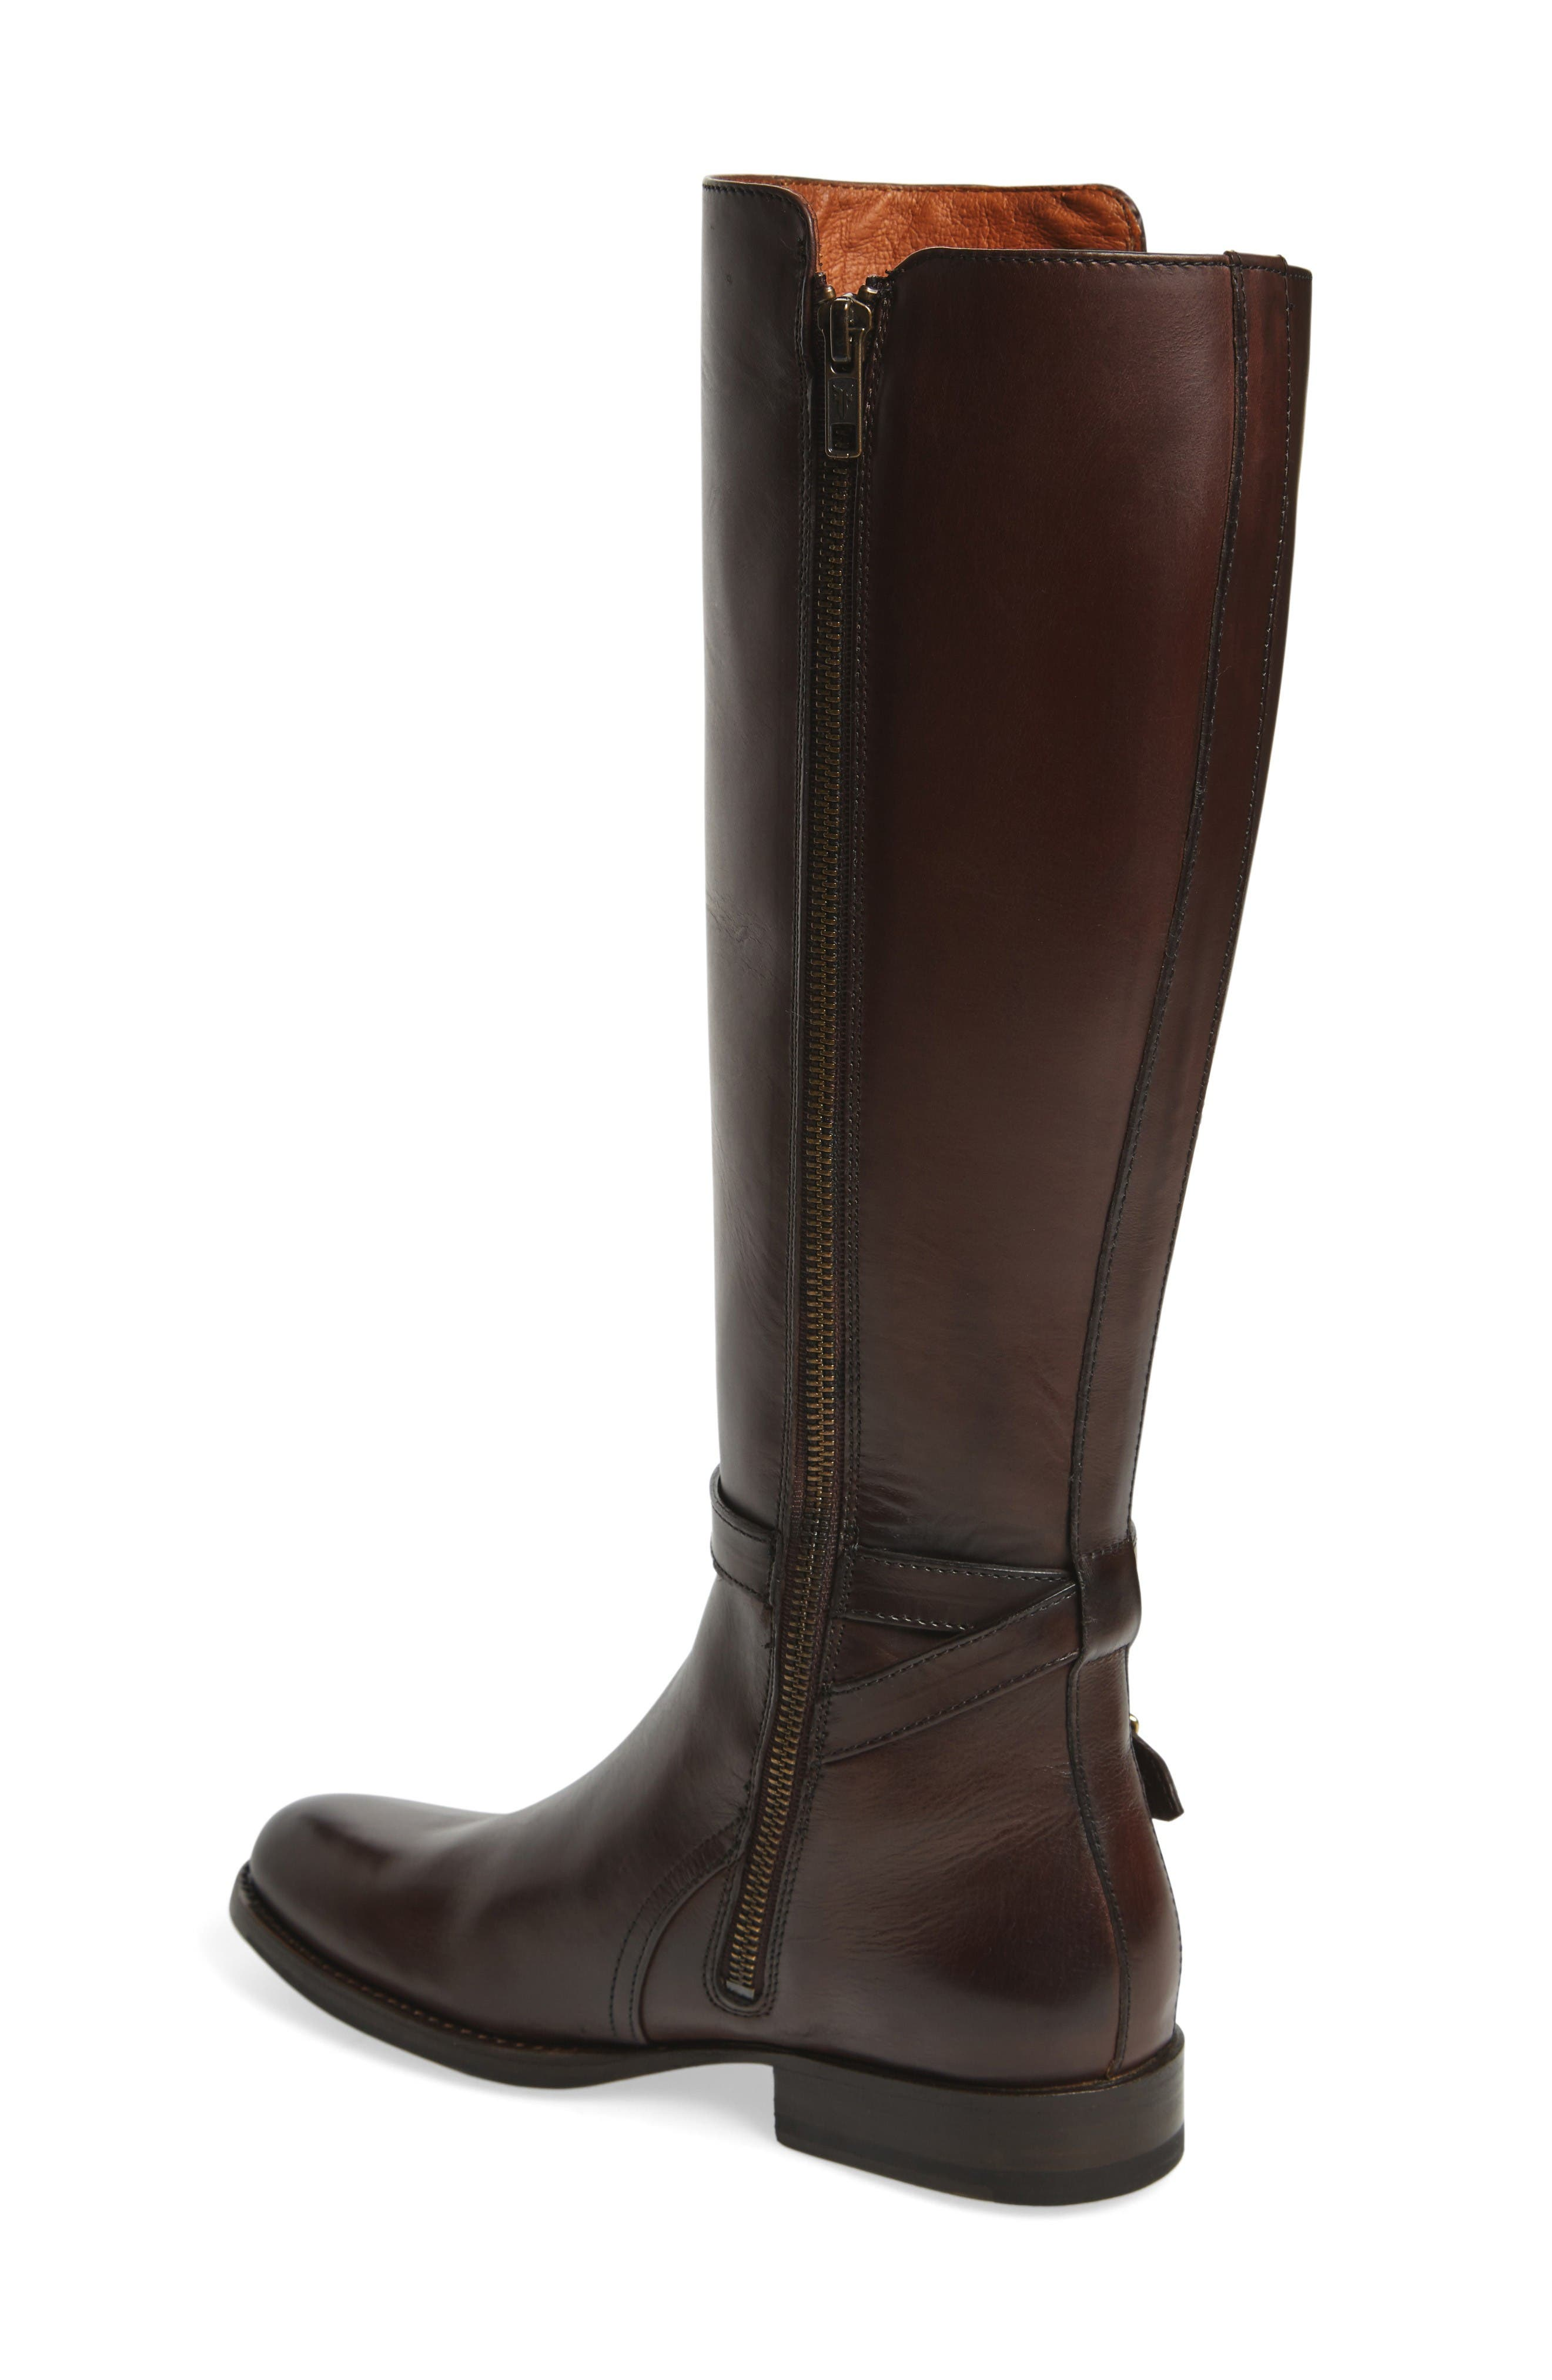 Alternate Image 2  - Frye Jordan Buckle Strap Knee High Boot (Women)